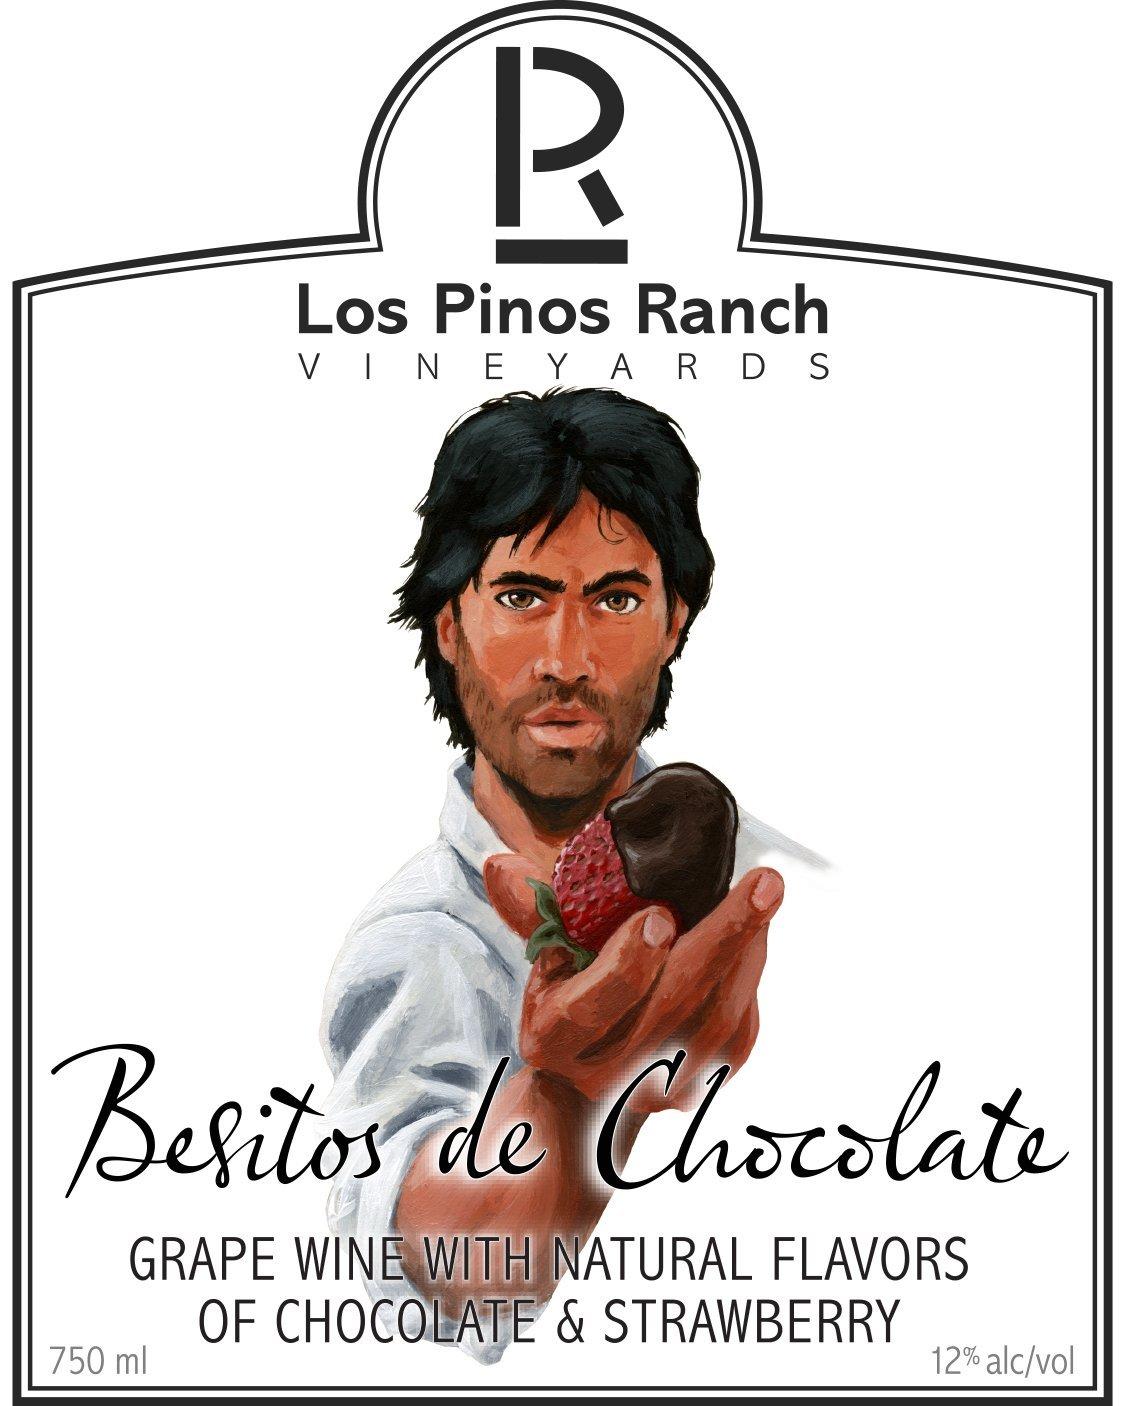 NV Los Pinos Ranch Vineyards Besitos de Chocolate 750 mL at ...